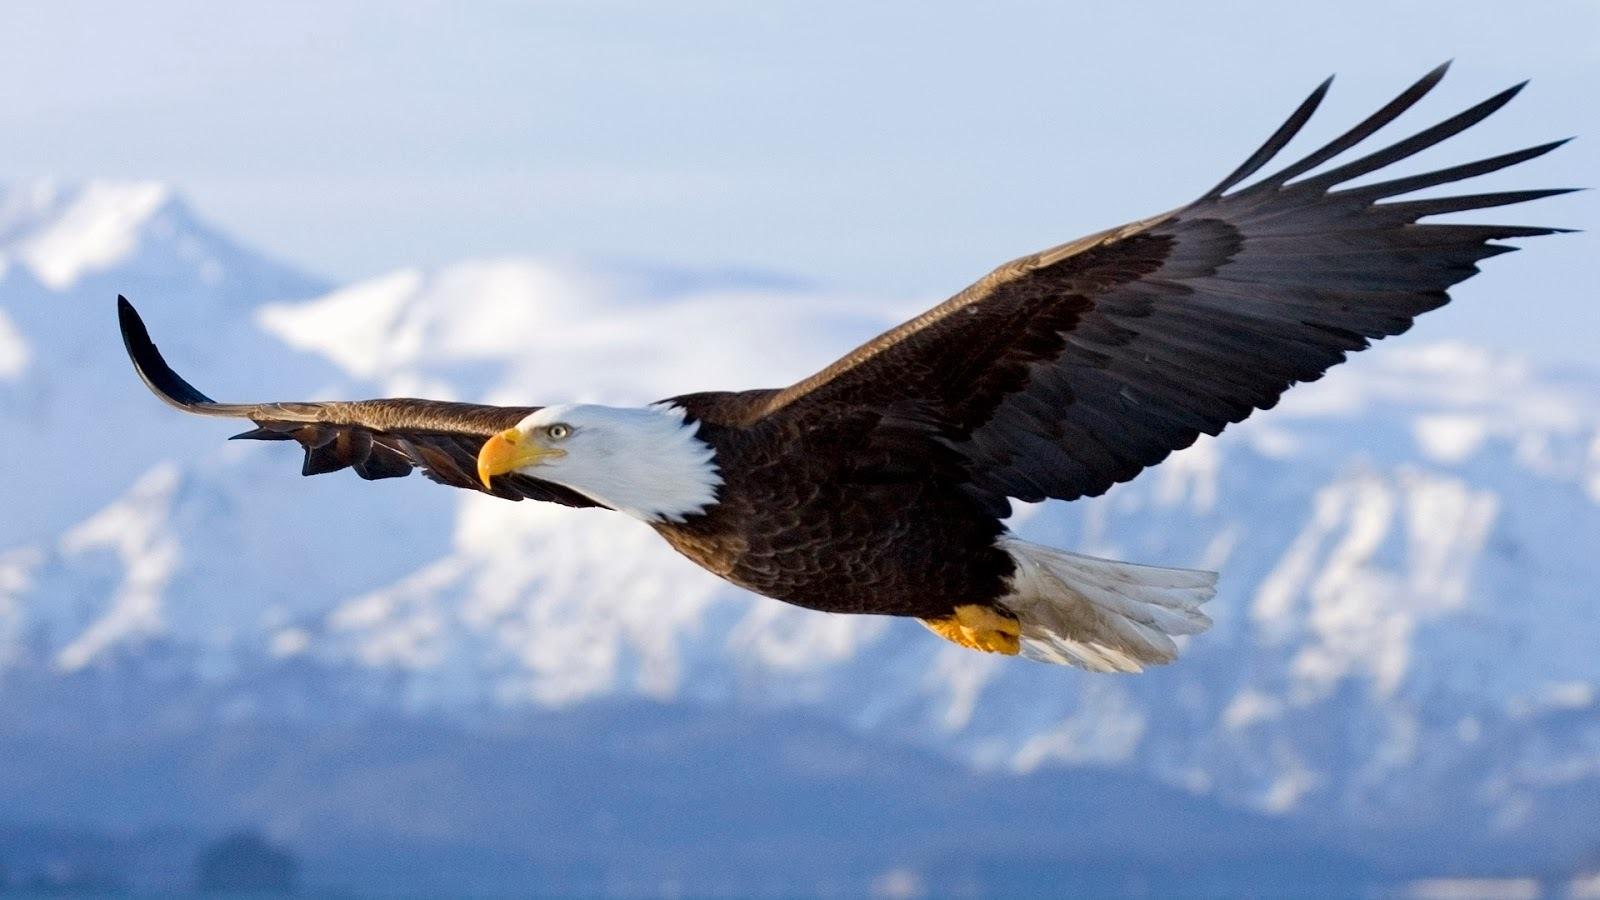 águia - foco e disciplina